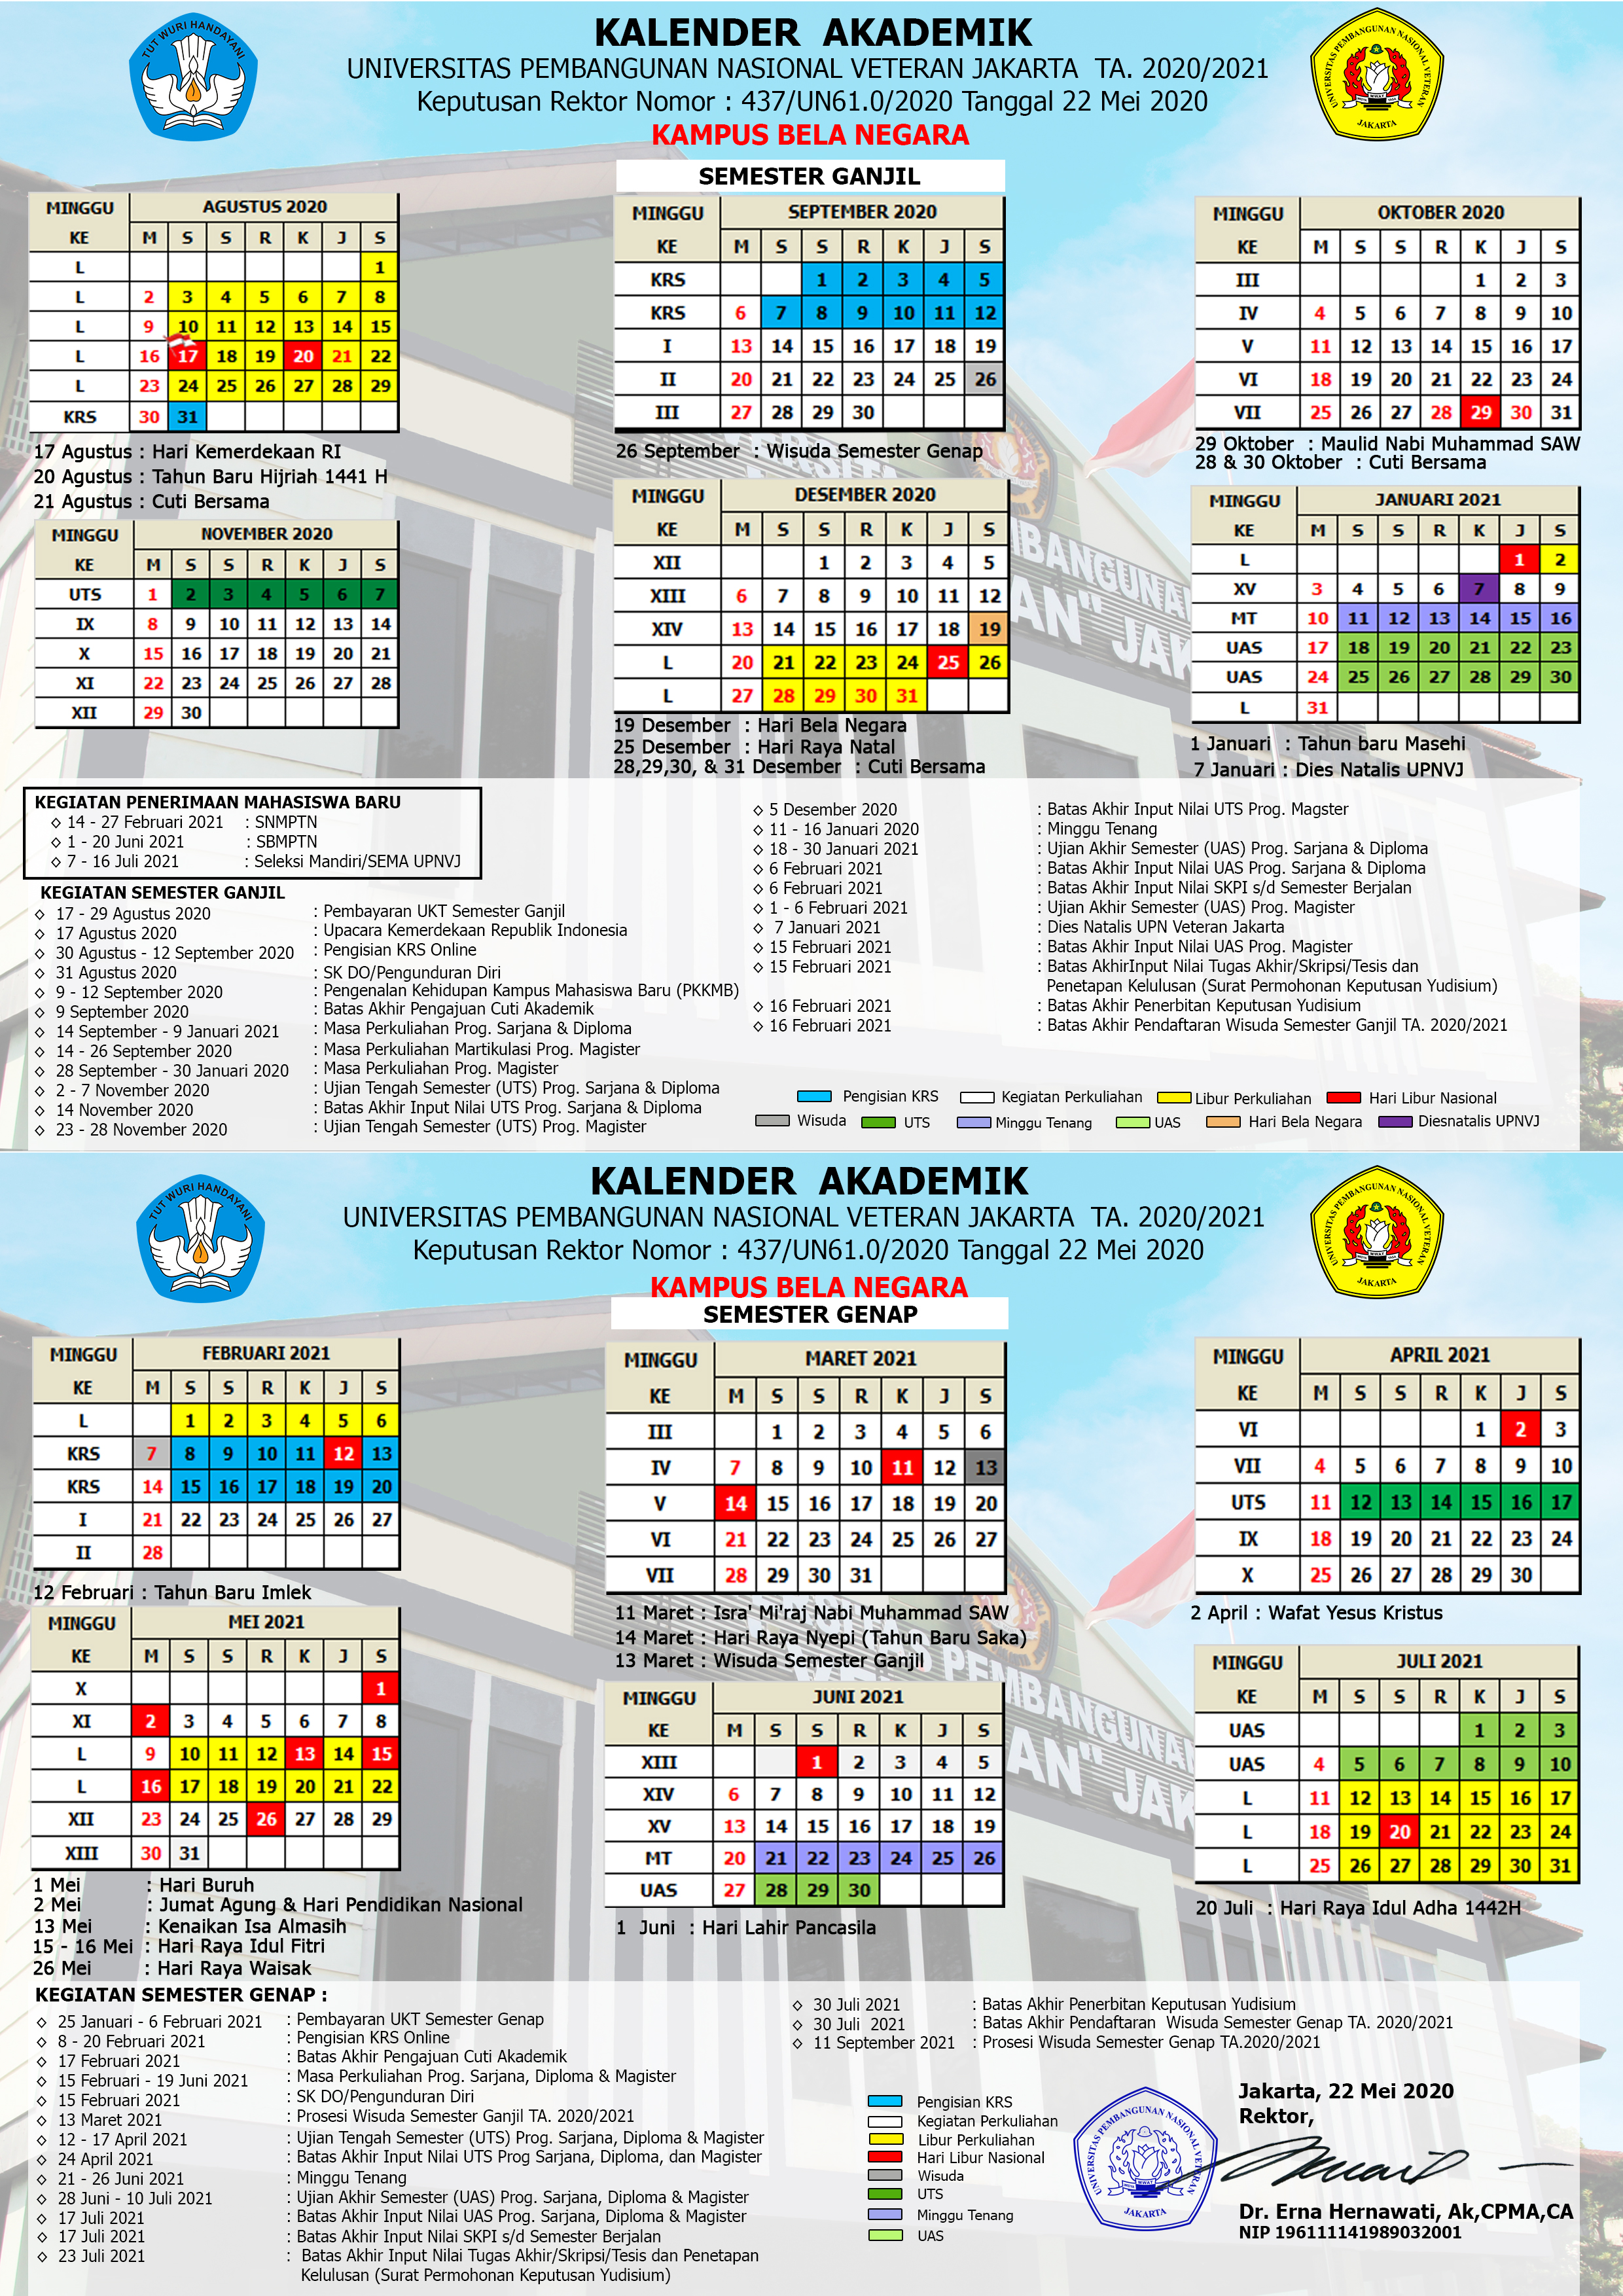 kalender_Akademik_2020_2021.jpg